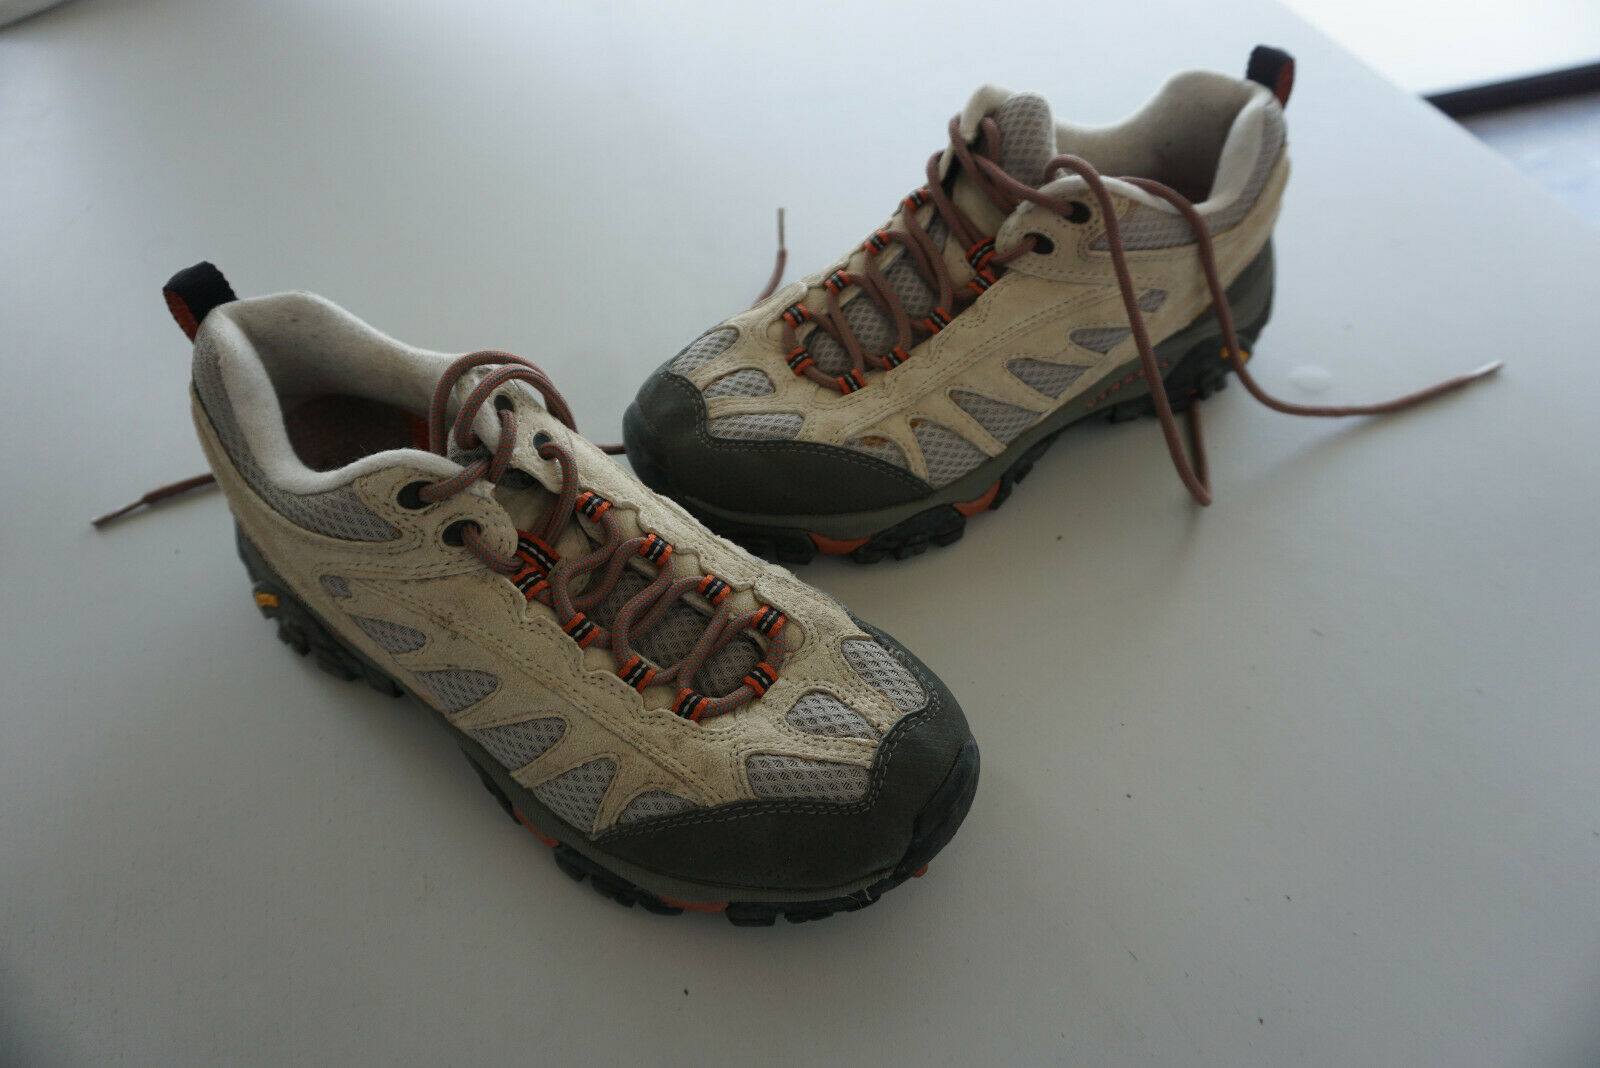 MERRELL Continum Herren Schuhe Wander Trekking Outdoor Vibram Gr.41 Beige grau